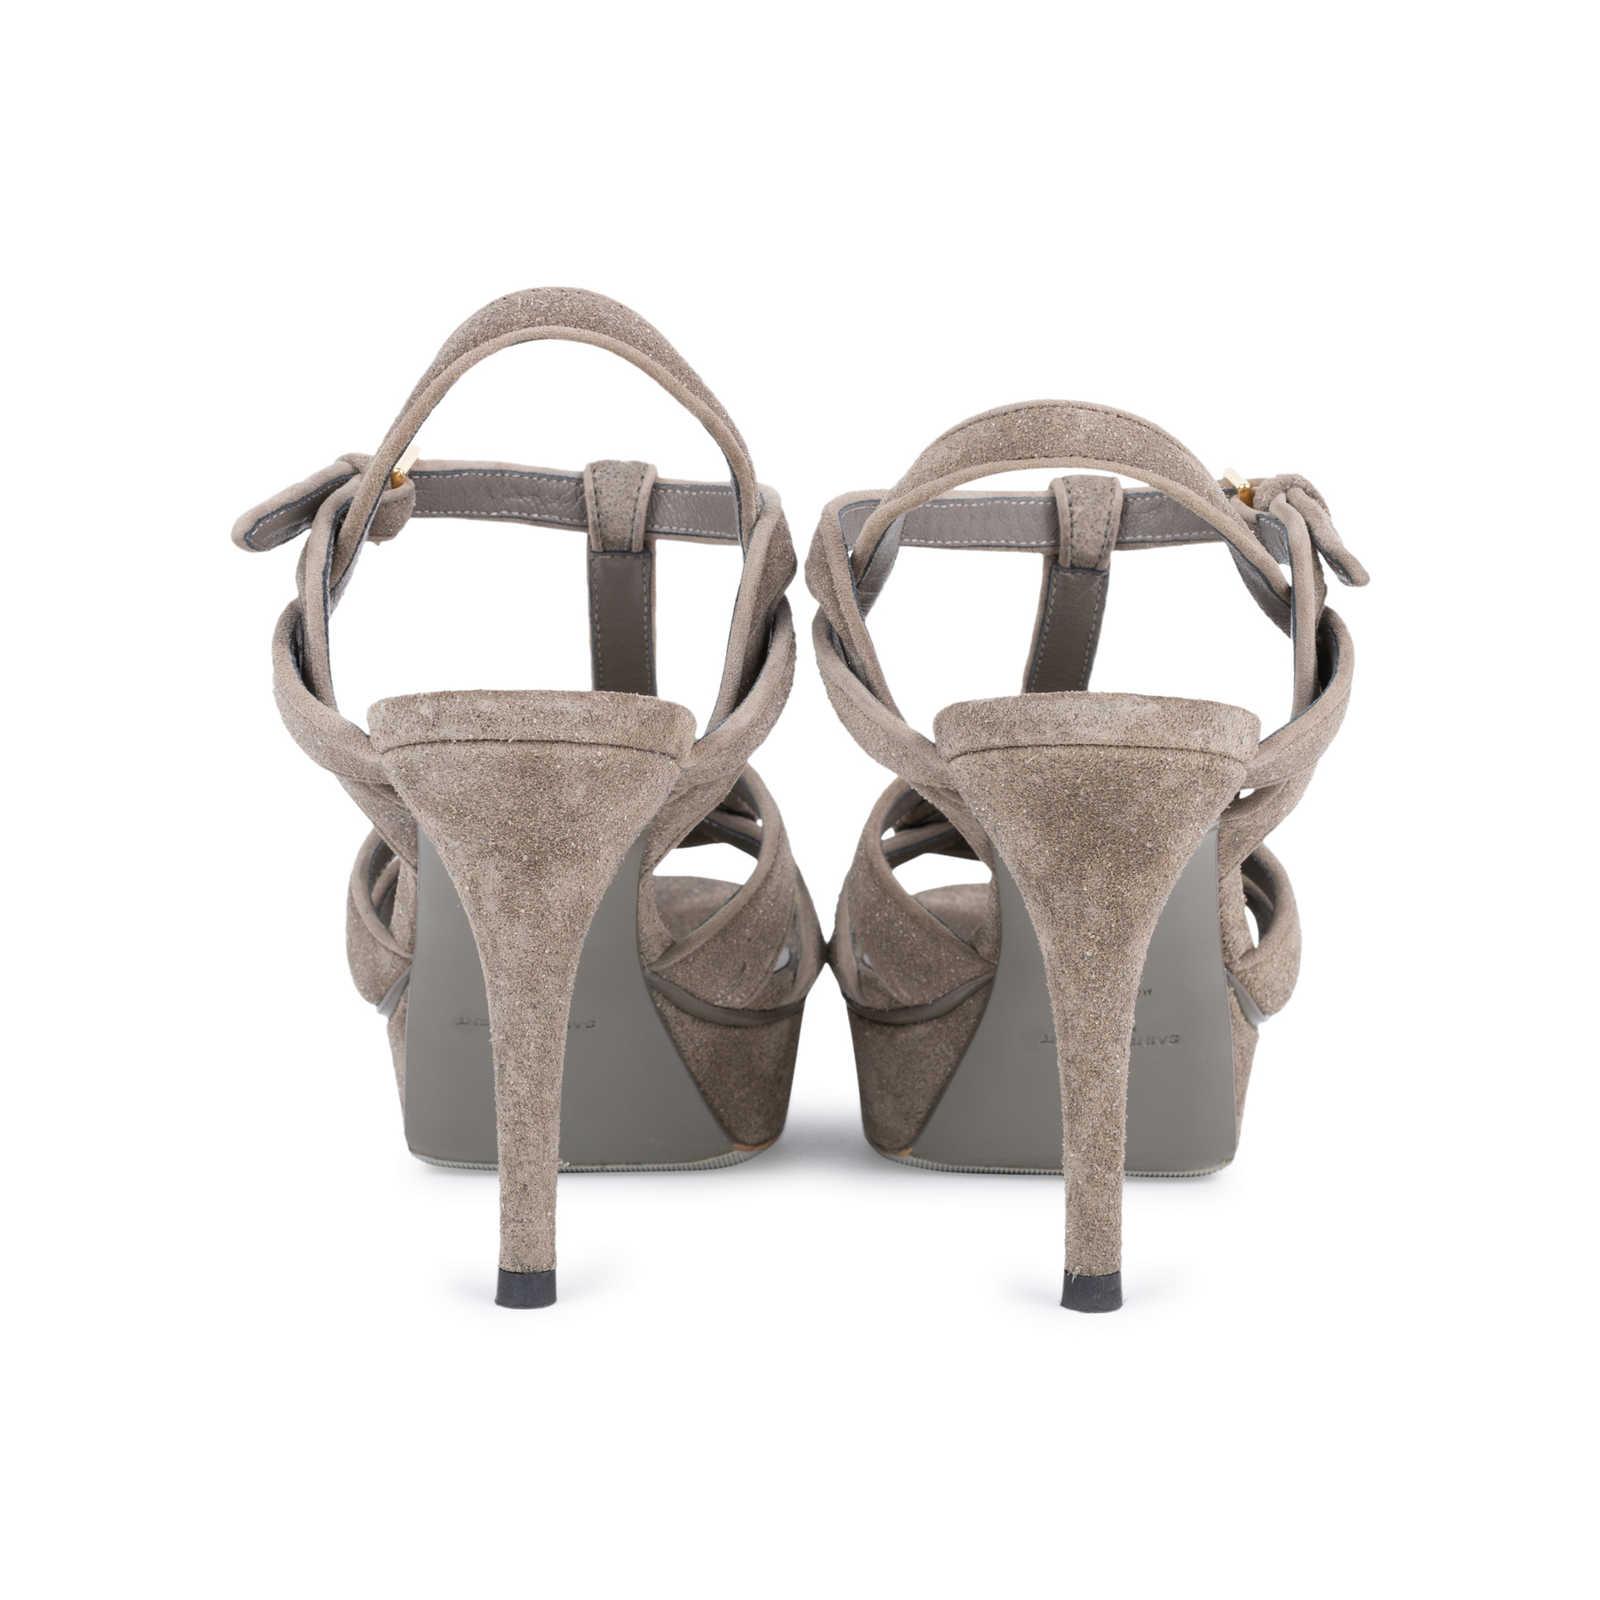 7c59b84034e ... Authentic Second Hand Yves Saint Laurent Glitter Effect Tribute Sandals  (PSS-328-00019